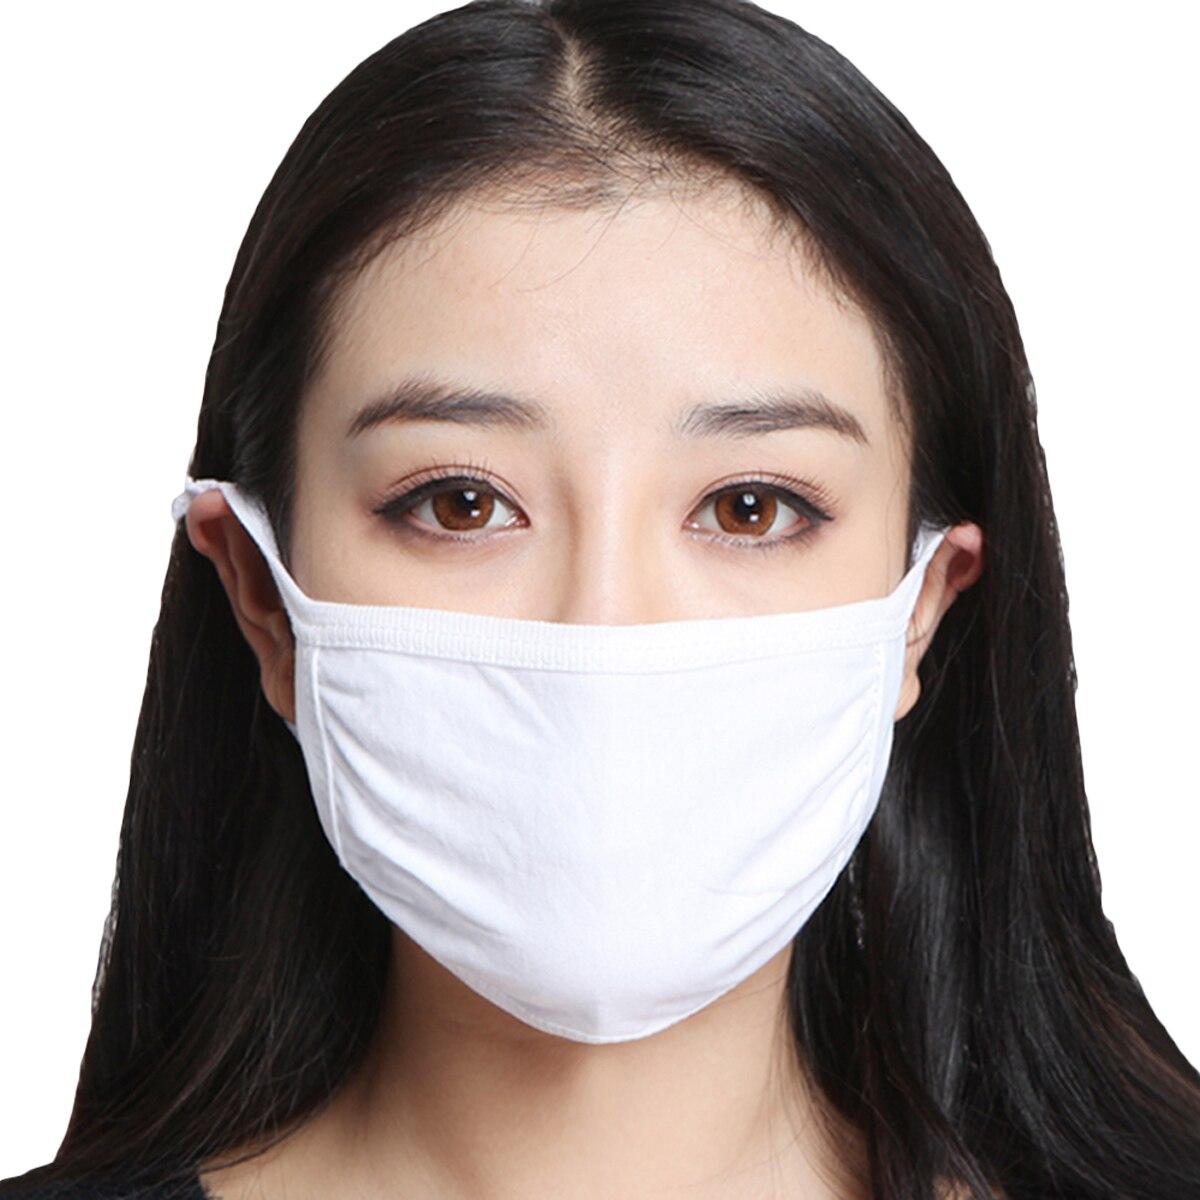 Unisex Women Men Mask Reusable Cotton Fabric Face Mask Black White Washable Handmade Cotton Mask